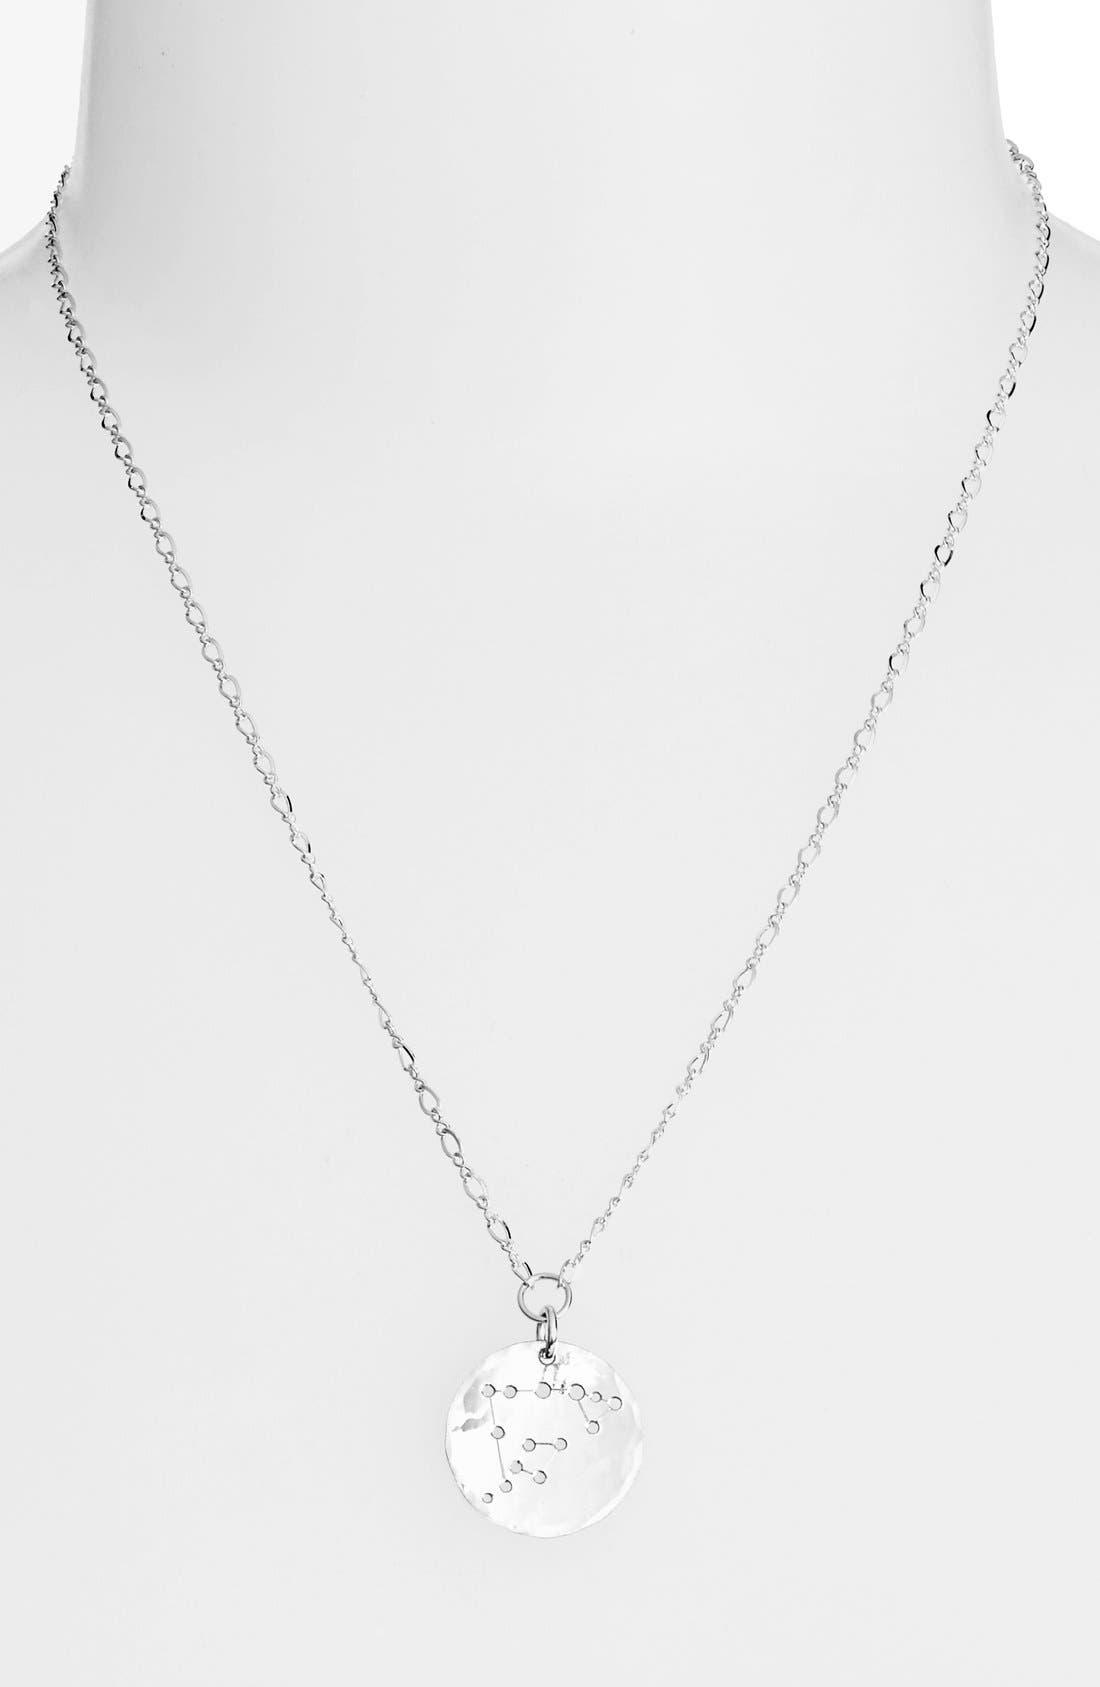 Ija 'Large Zodiac' Sterling Silver Necklace